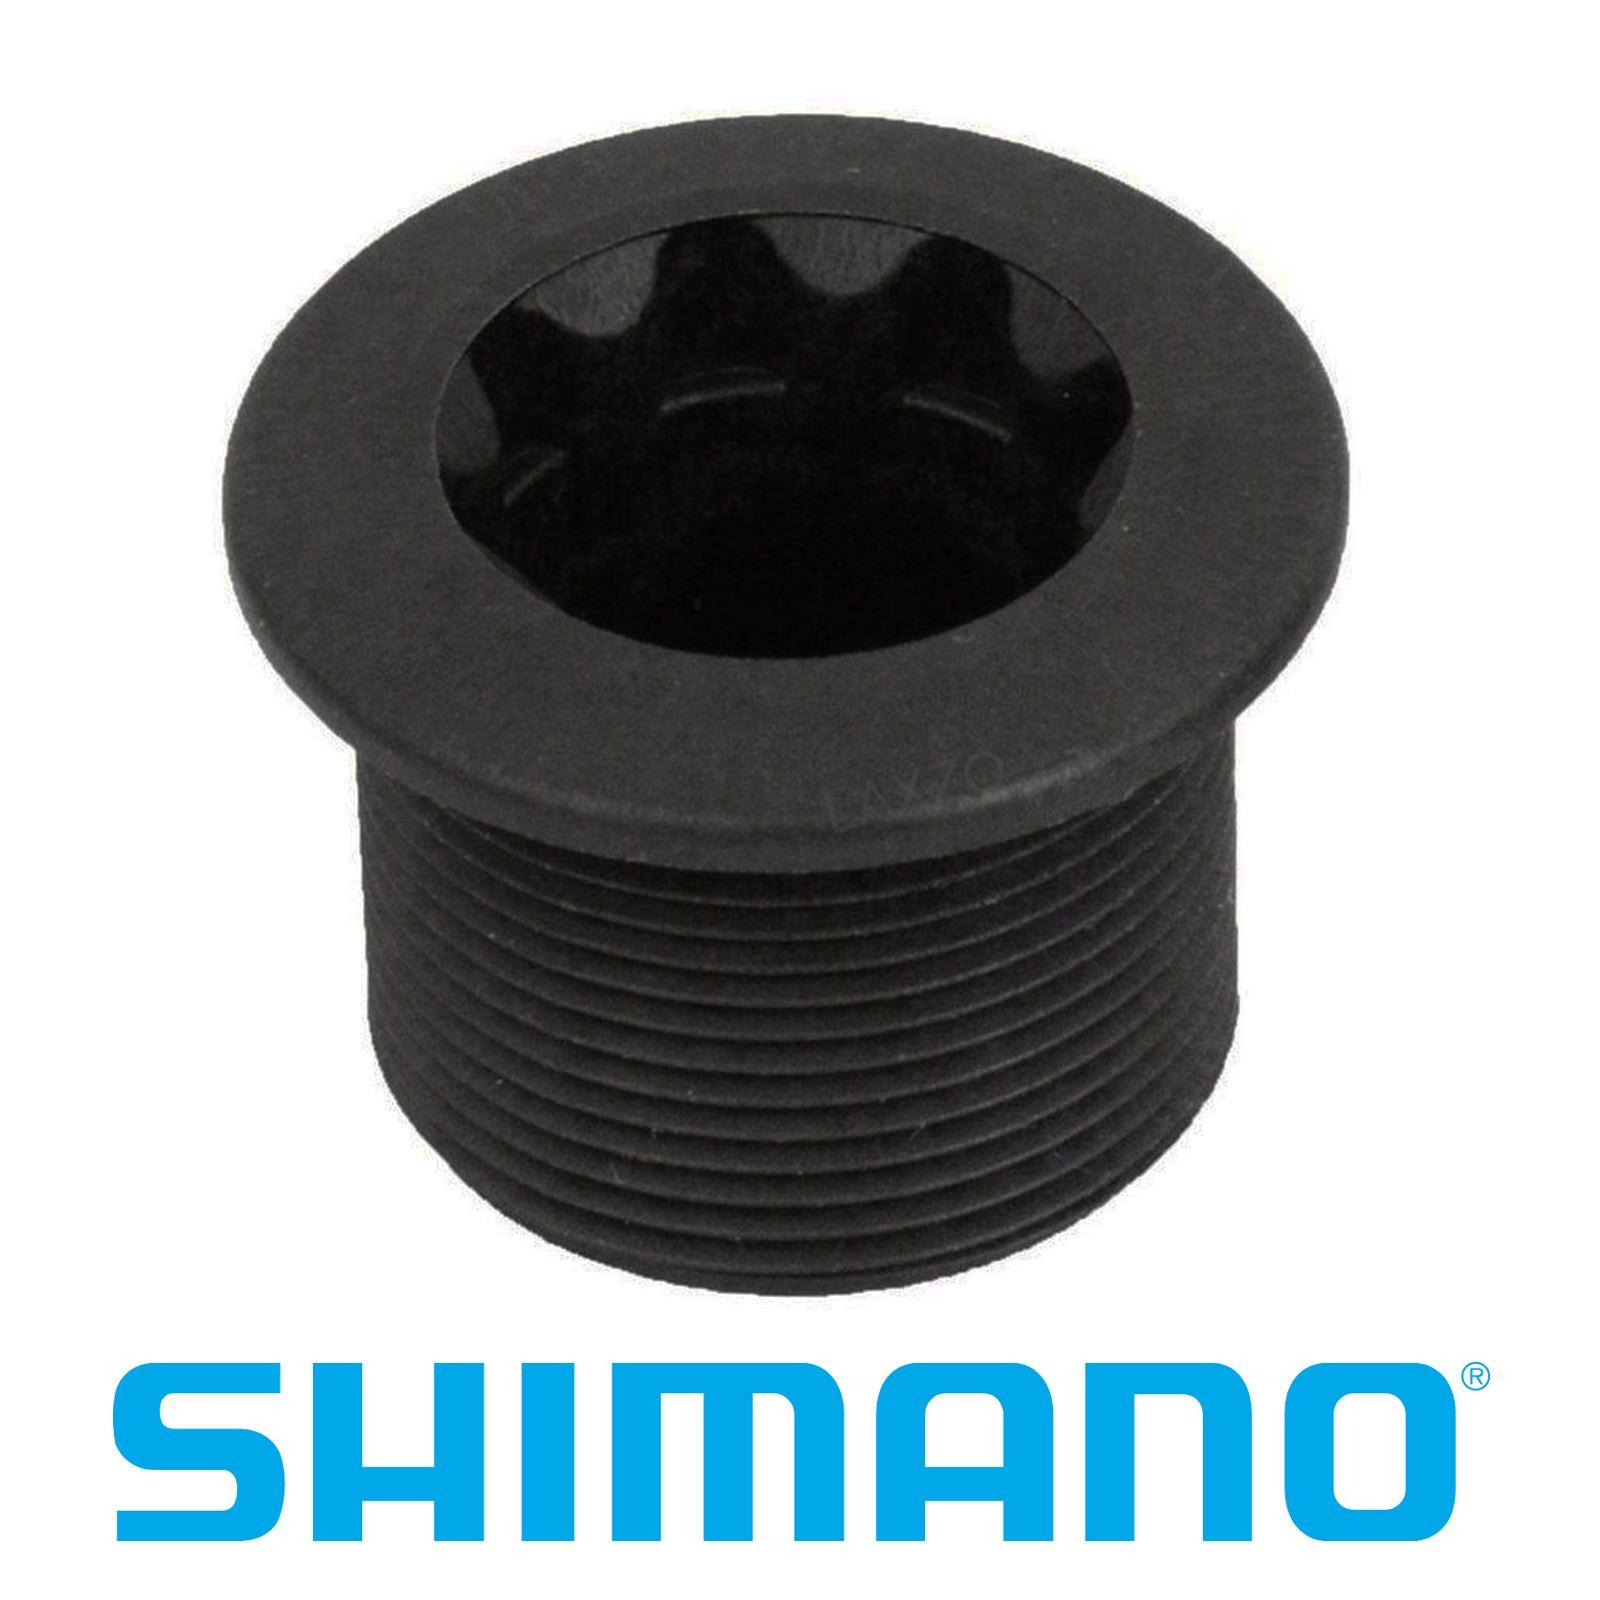 Shimano Dura-Ace 9000//7900 Crank Arm Fixing Bolt 1st version